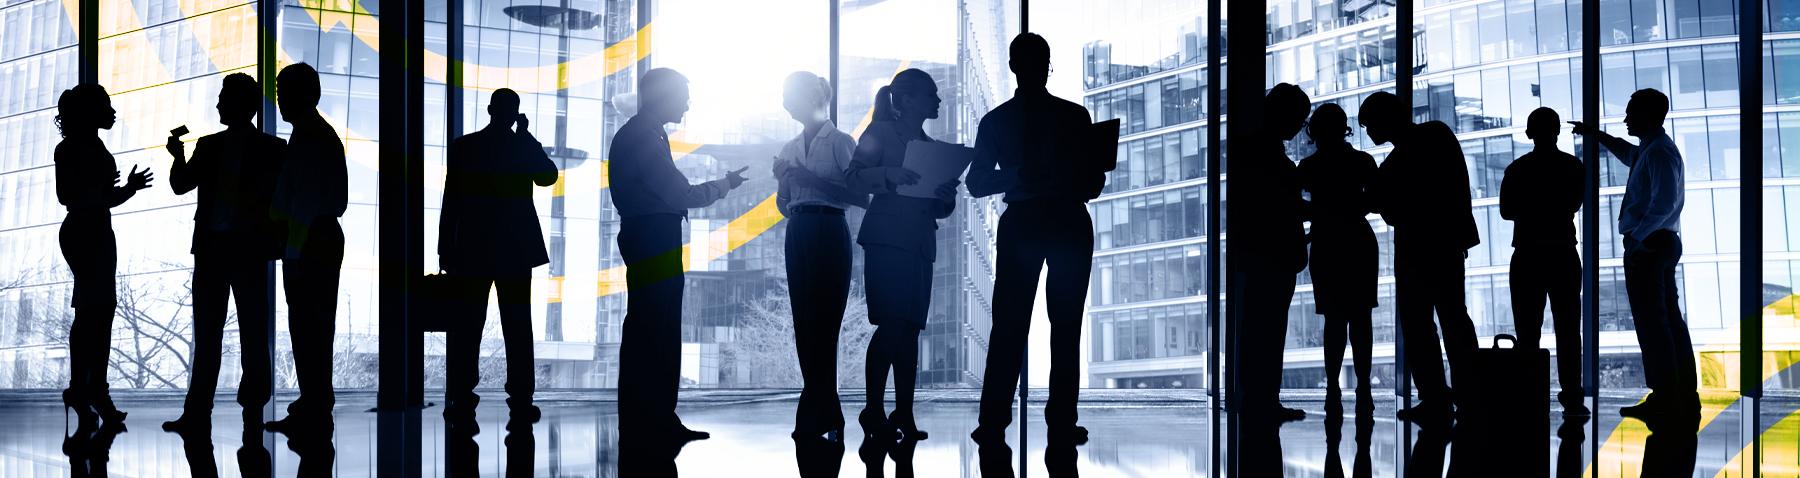 International Security Management Association Conferences